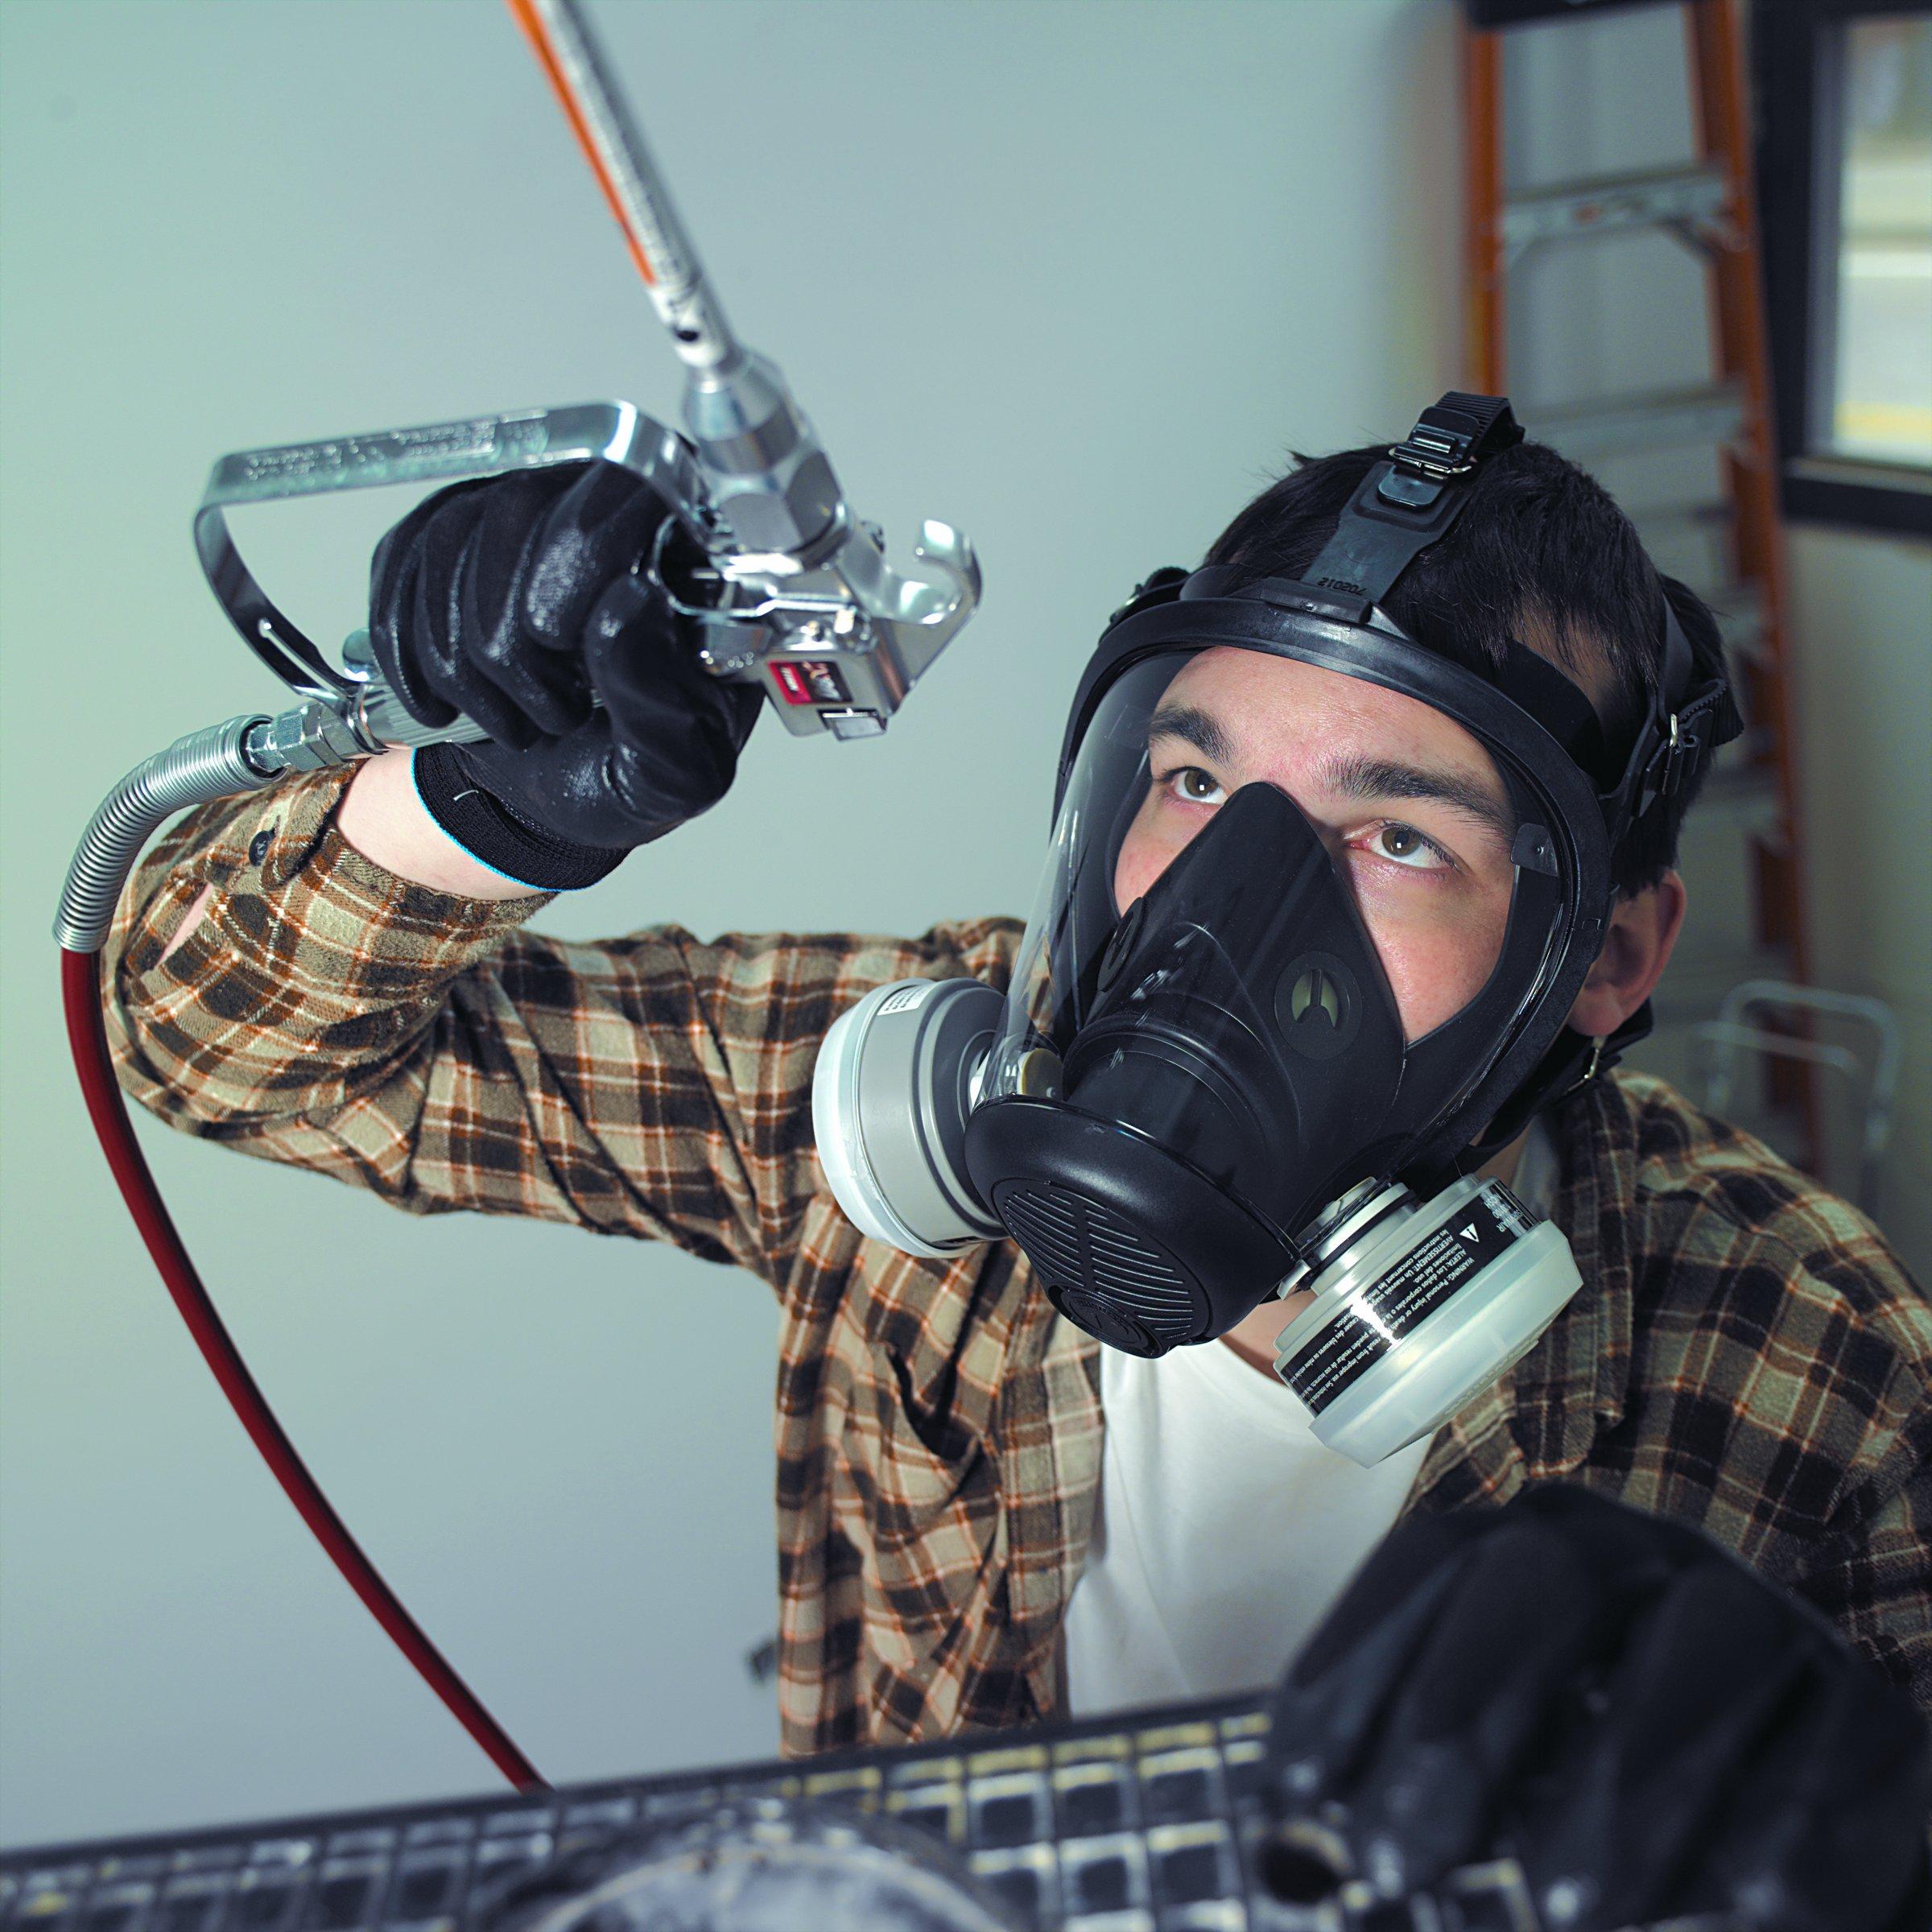 Honeywell 766184 Survivair Opti-Fit Silicone Full Facepiece Respirator, Medium by Honeywell (Image #2)